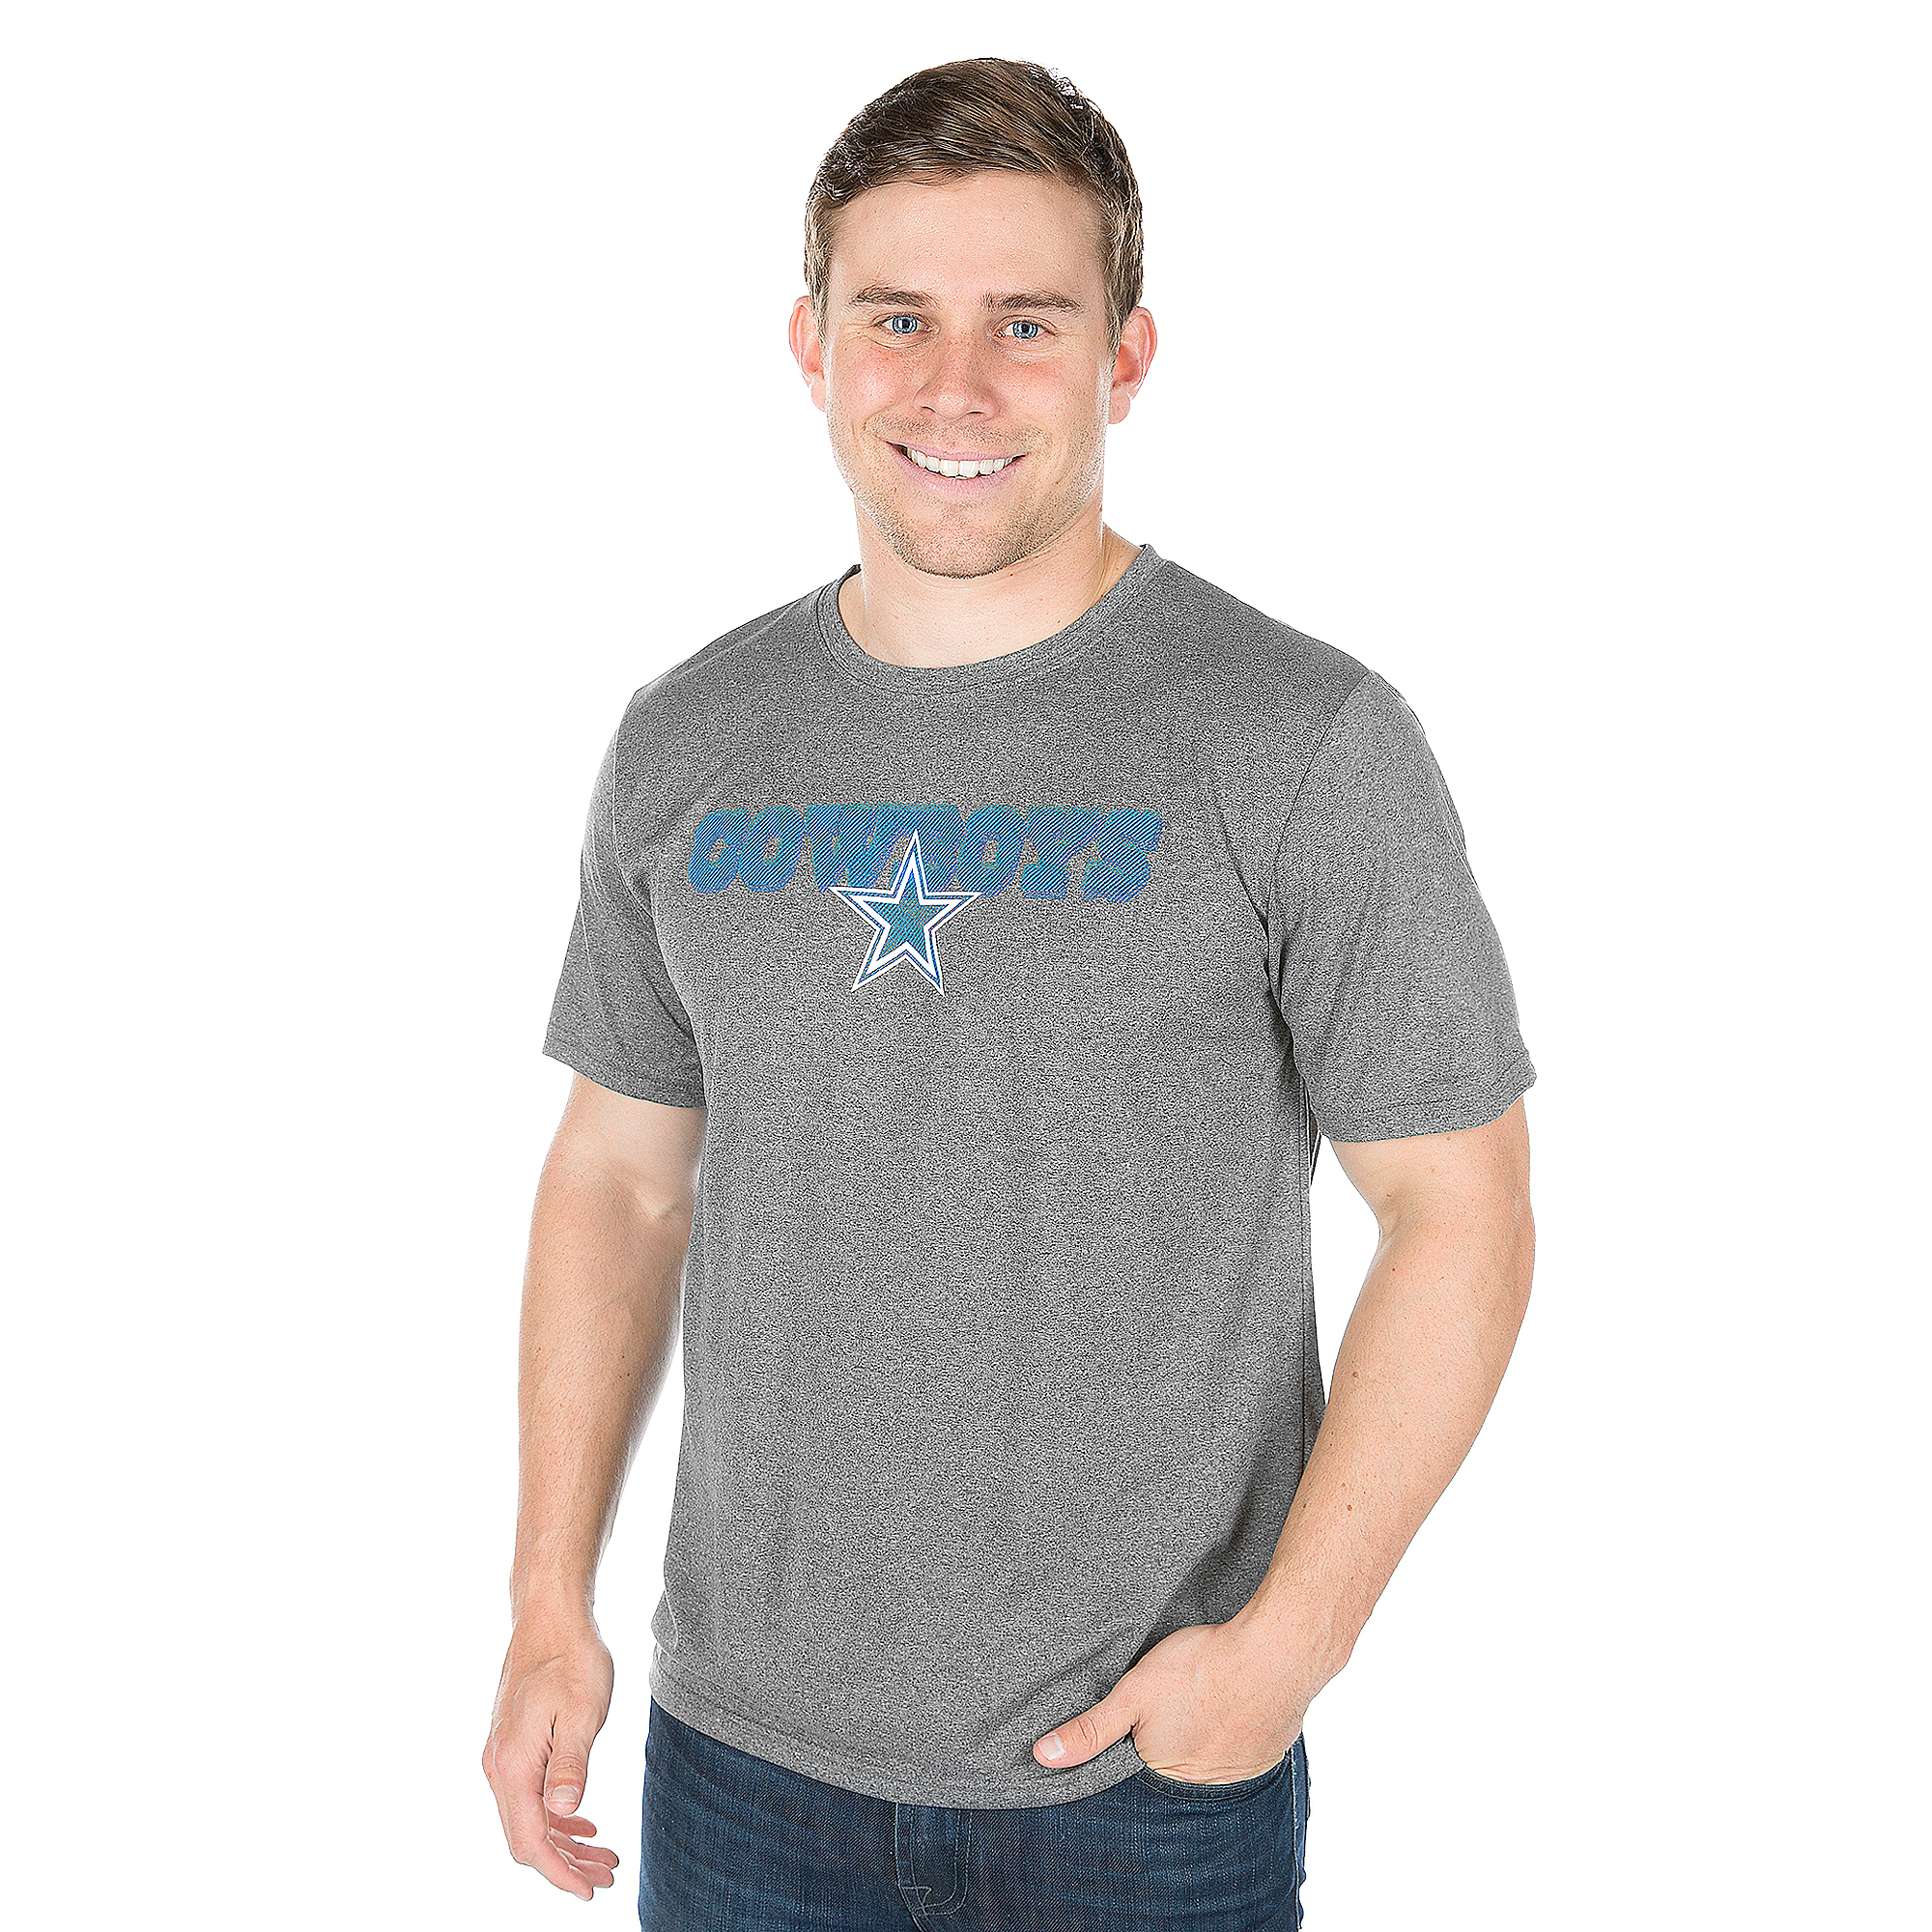 Dallas Cowboys Slayer Short Sleeve Tee